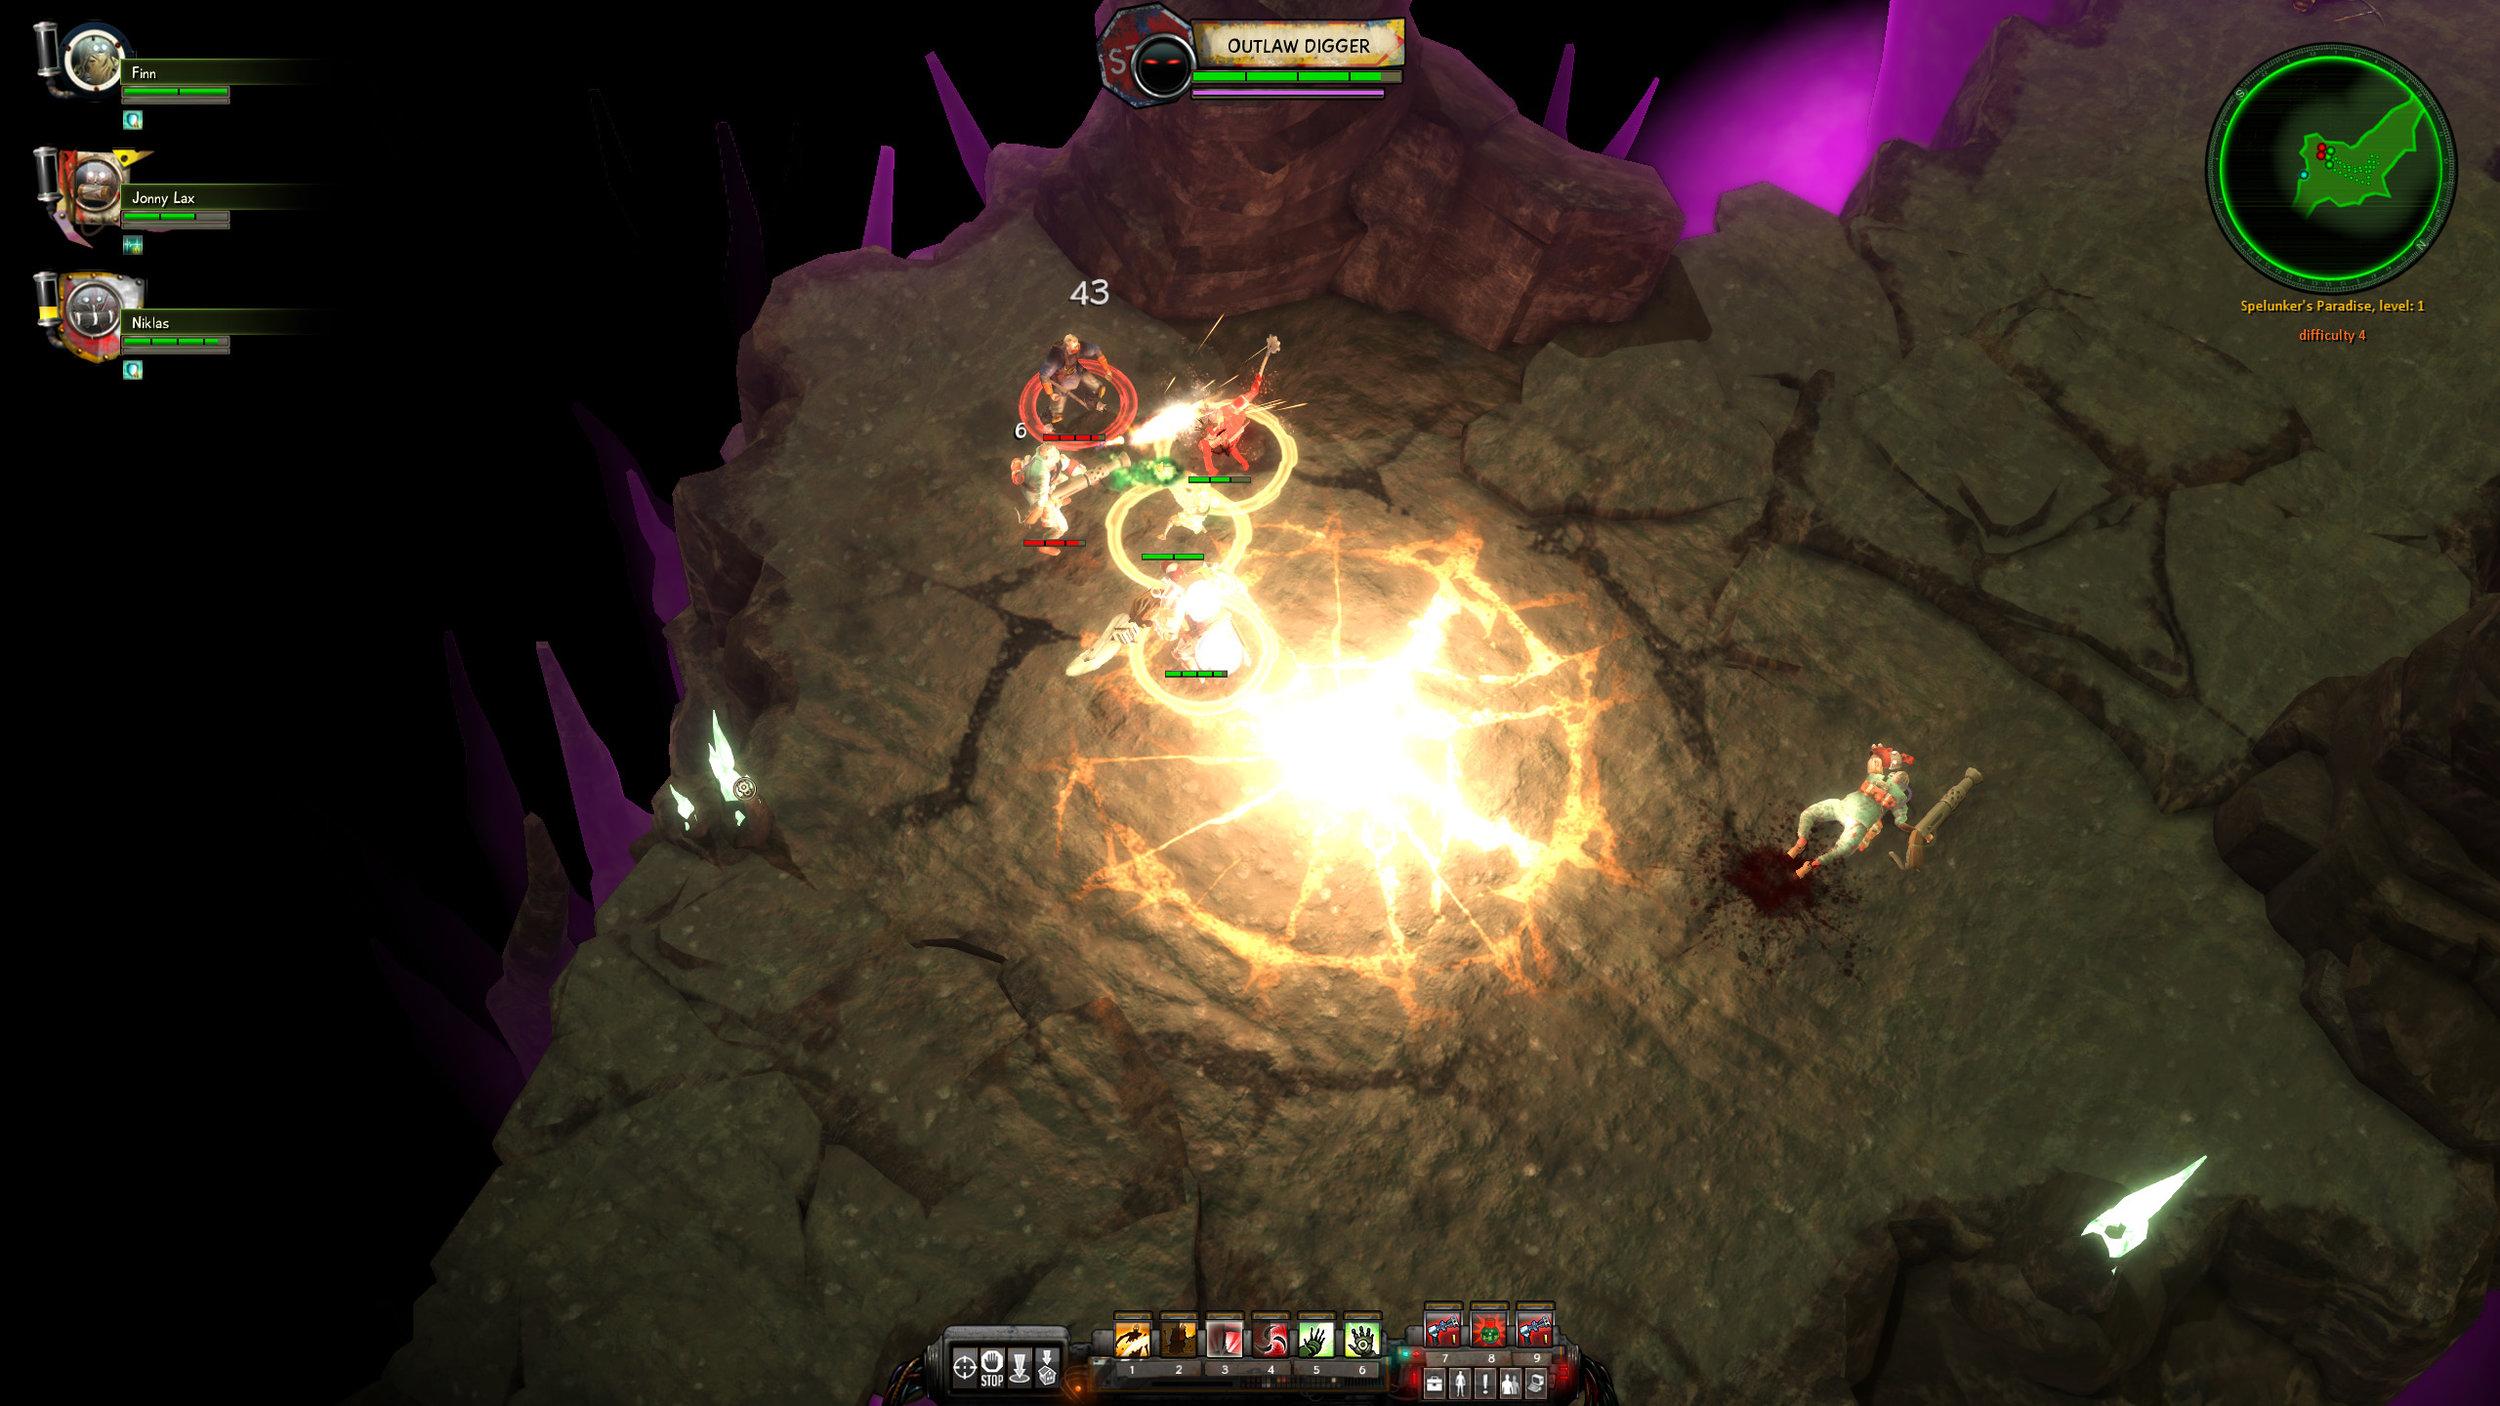 Krater Shadows over Solside Screenshot 7.jpg